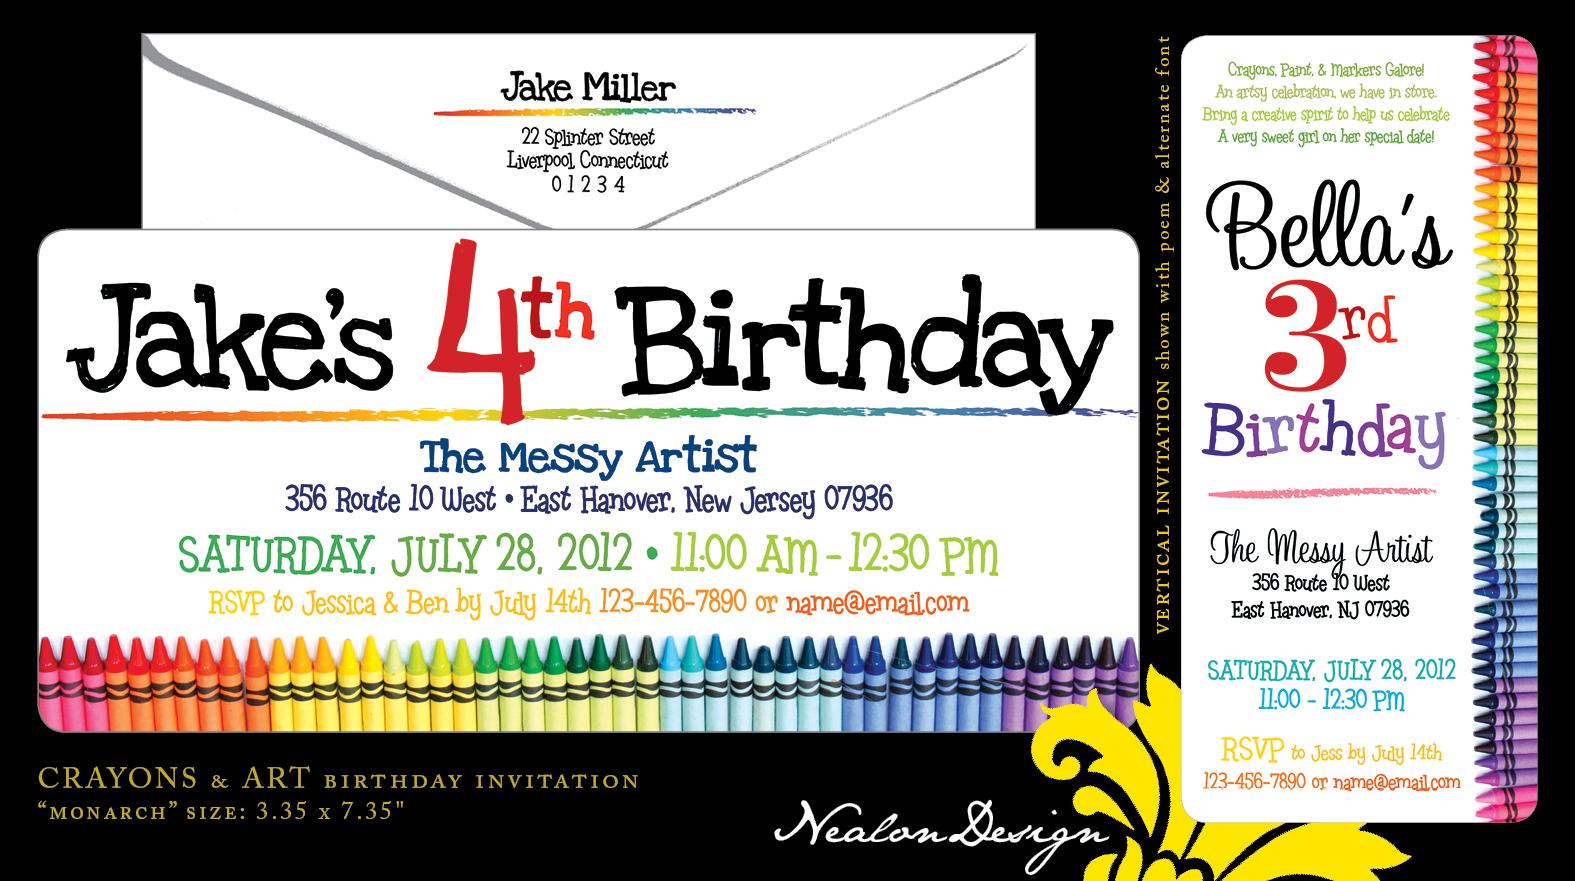 Nealon Design Crayons Art Birthday Invitation Jpg 1575x881 Four Year Old Invitations